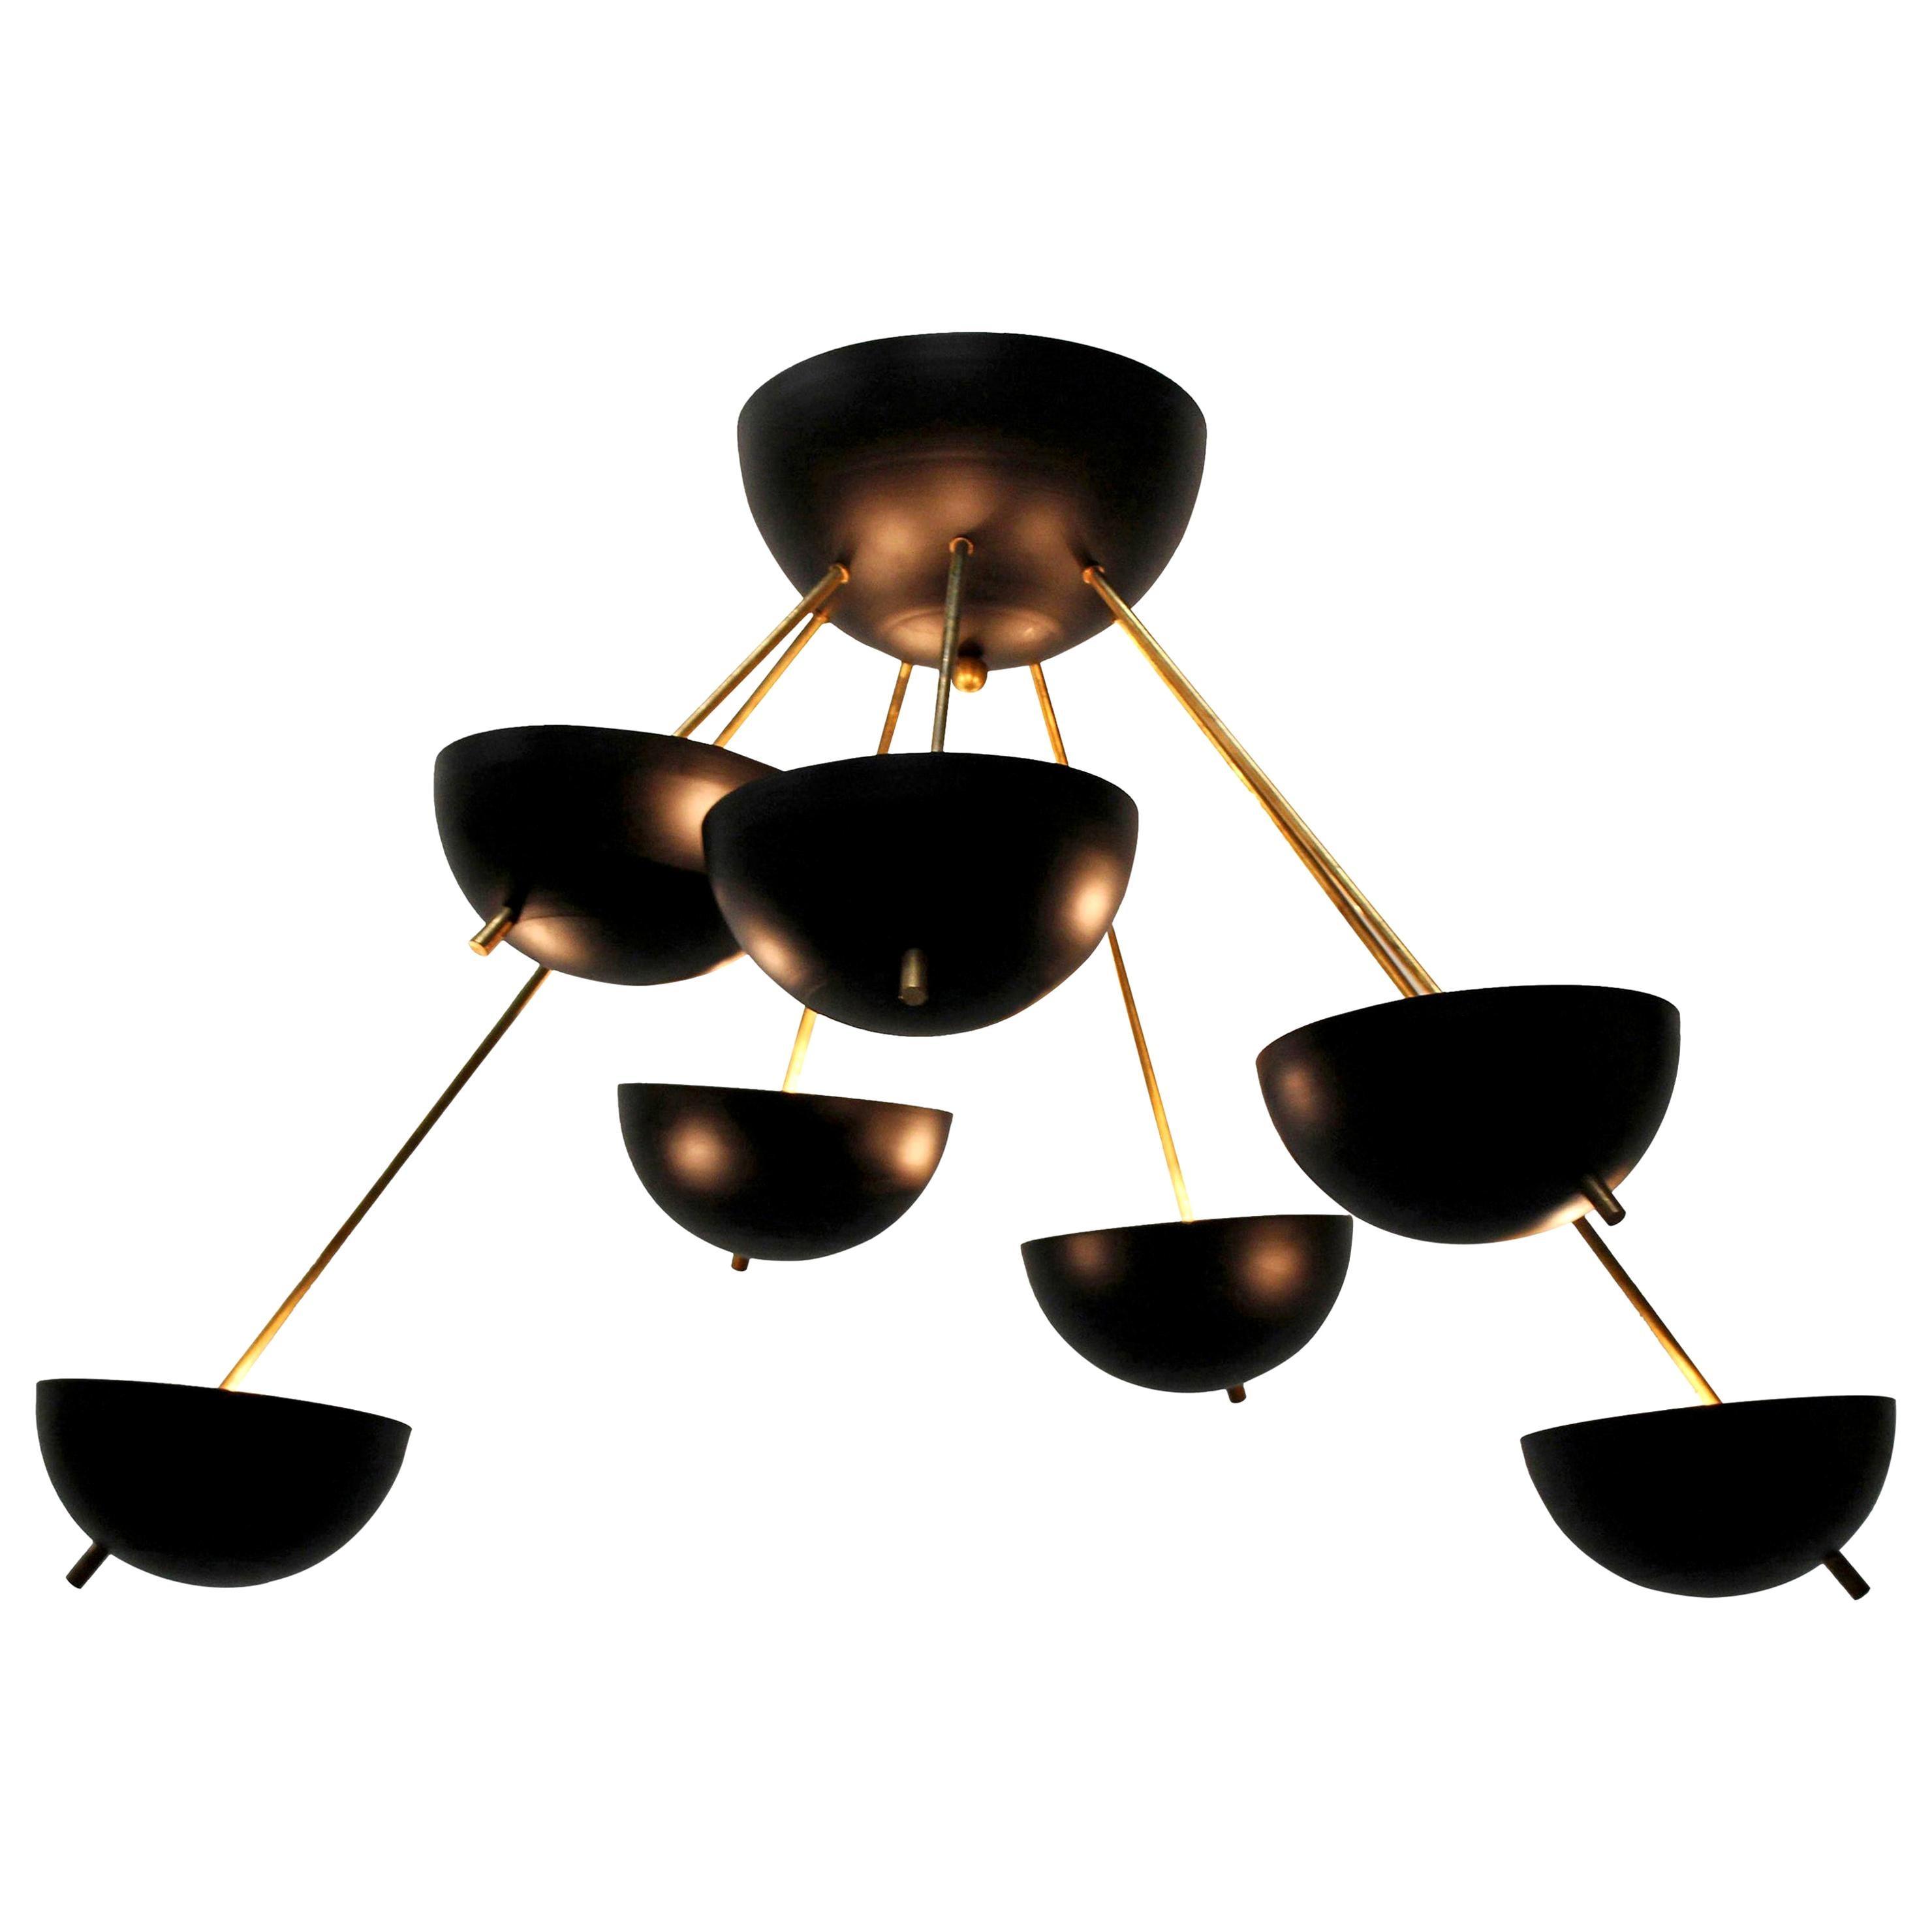 Midcentury Design Italian Sputnik Chandelier, Attributed to Stilnovo Black Gold